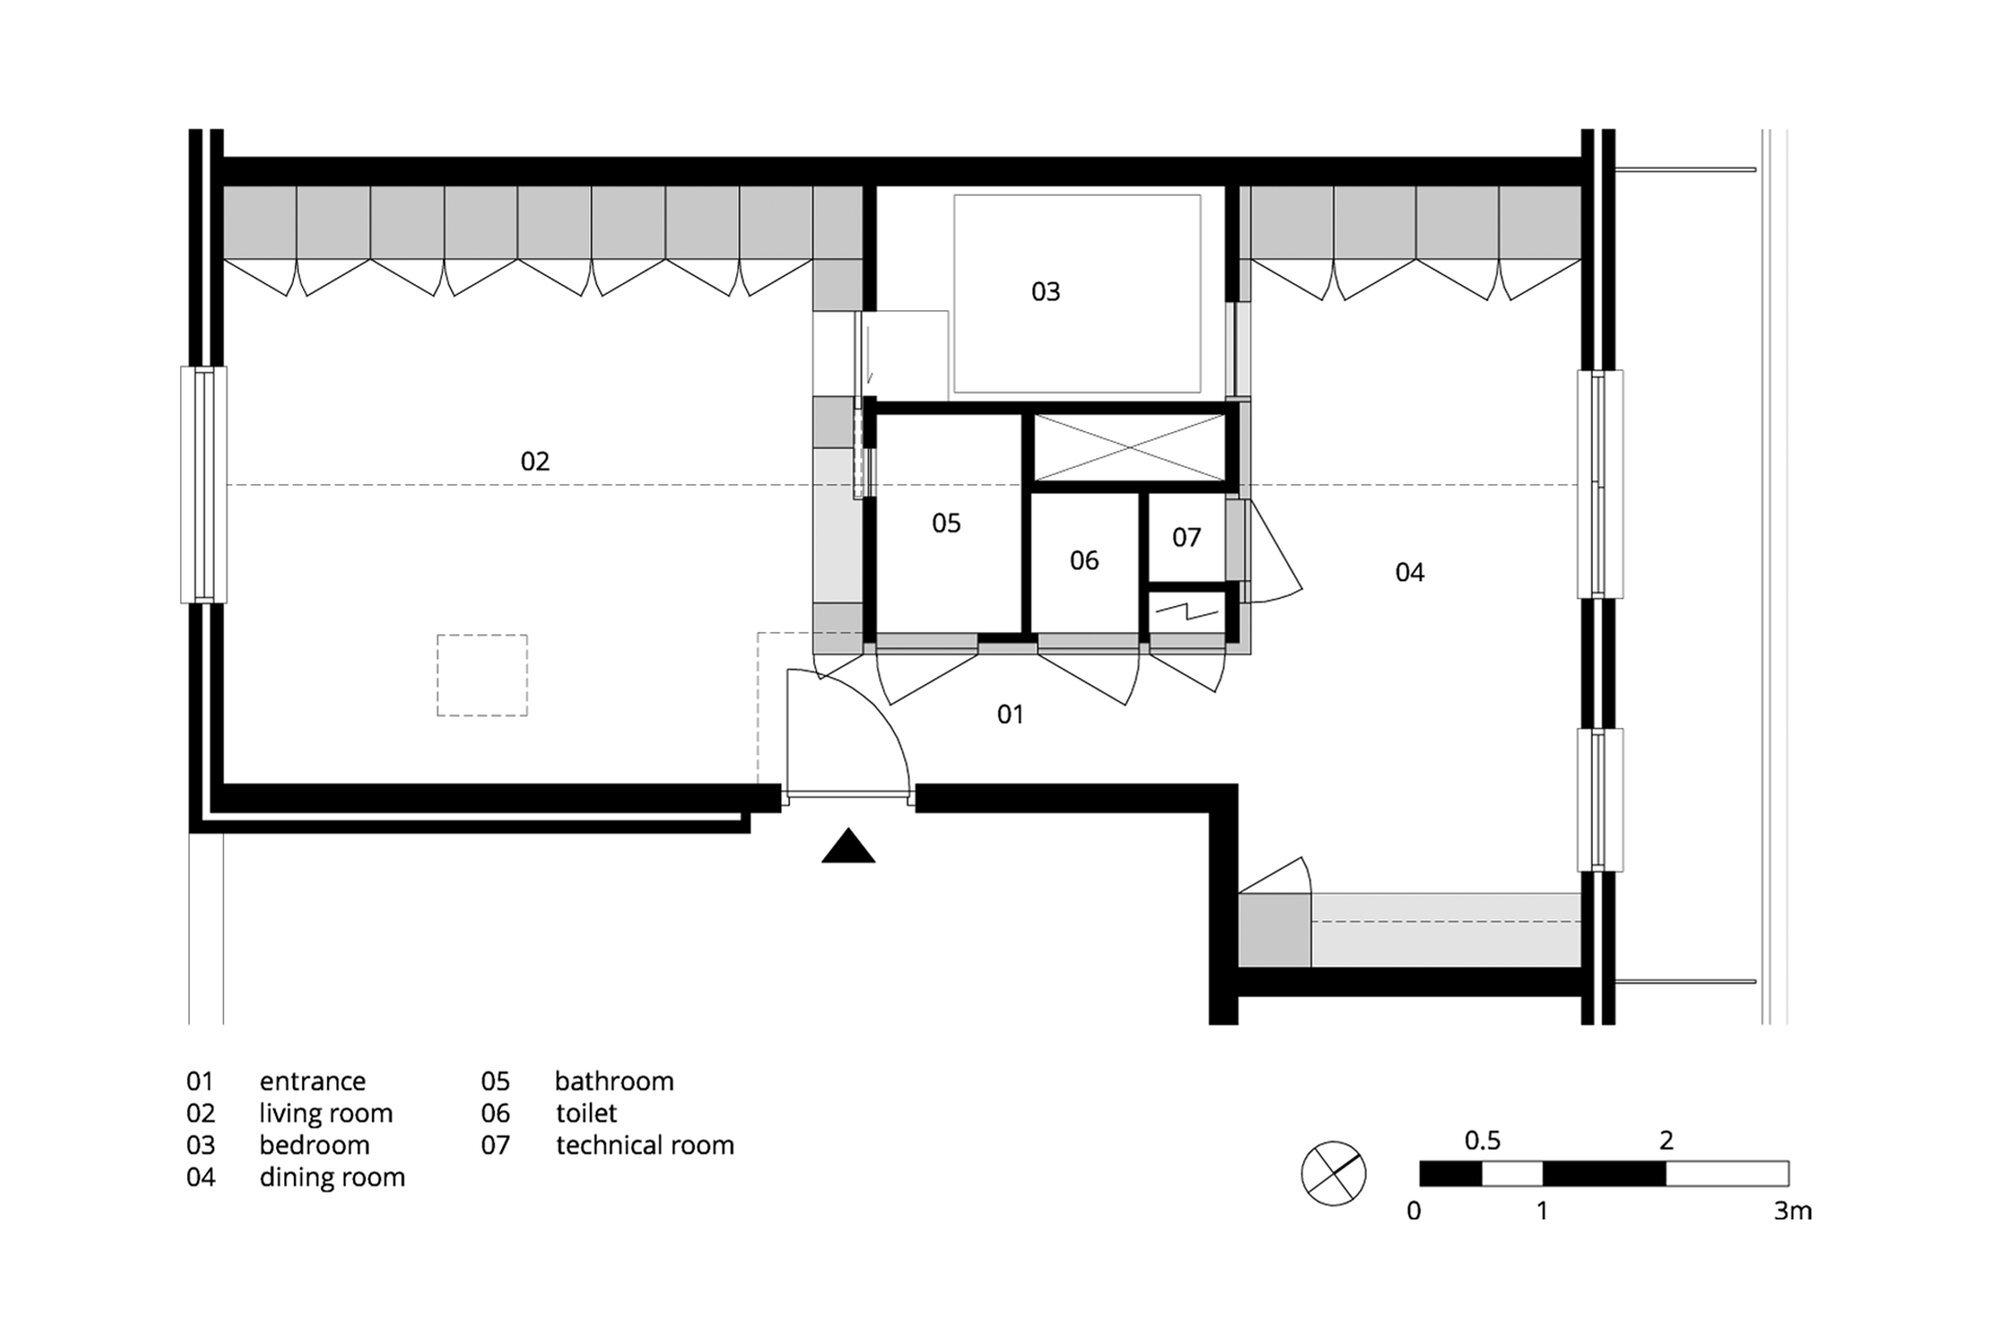 Amsterdam Urban Loft - Bureau Fraai - Amsterdam - Floor Plan - Humble Homes